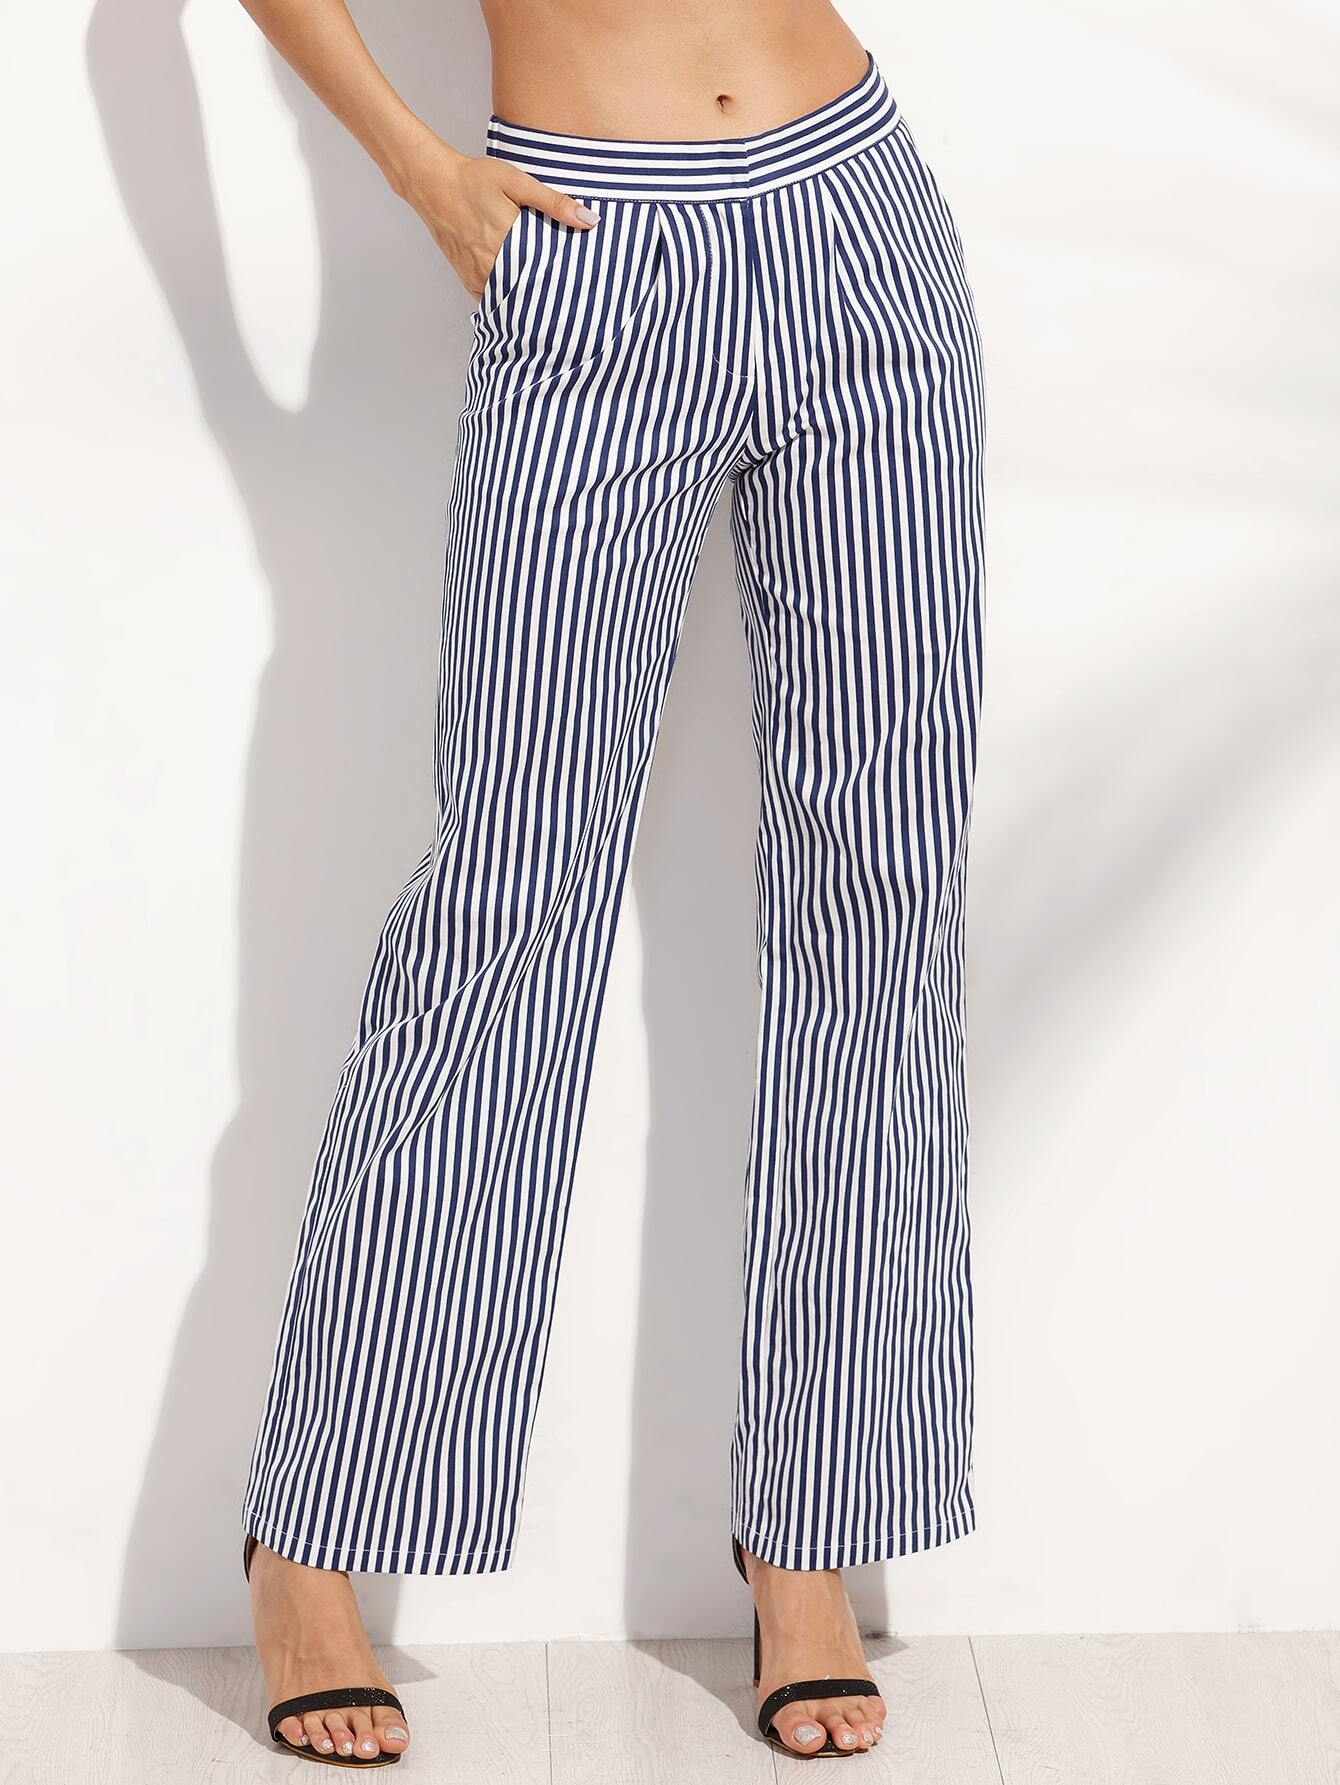 pantalons droits rayures verticales avec poches blanc et noir french shein sheinside. Black Bedroom Furniture Sets. Home Design Ideas